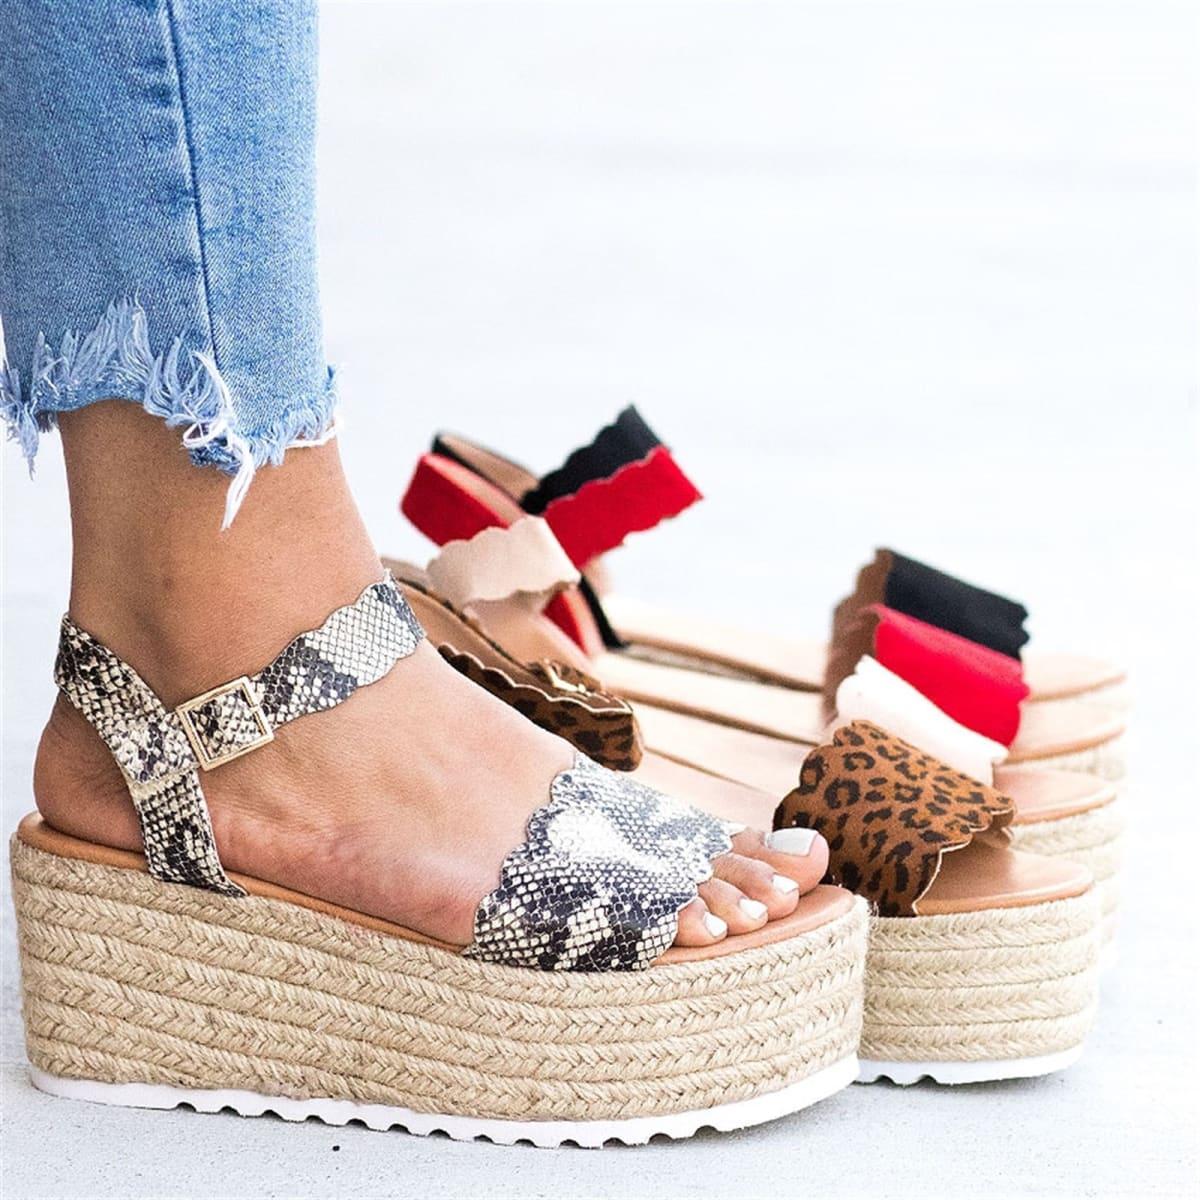 bec45d3dbea Scalloped Espadrille Platform Sandals